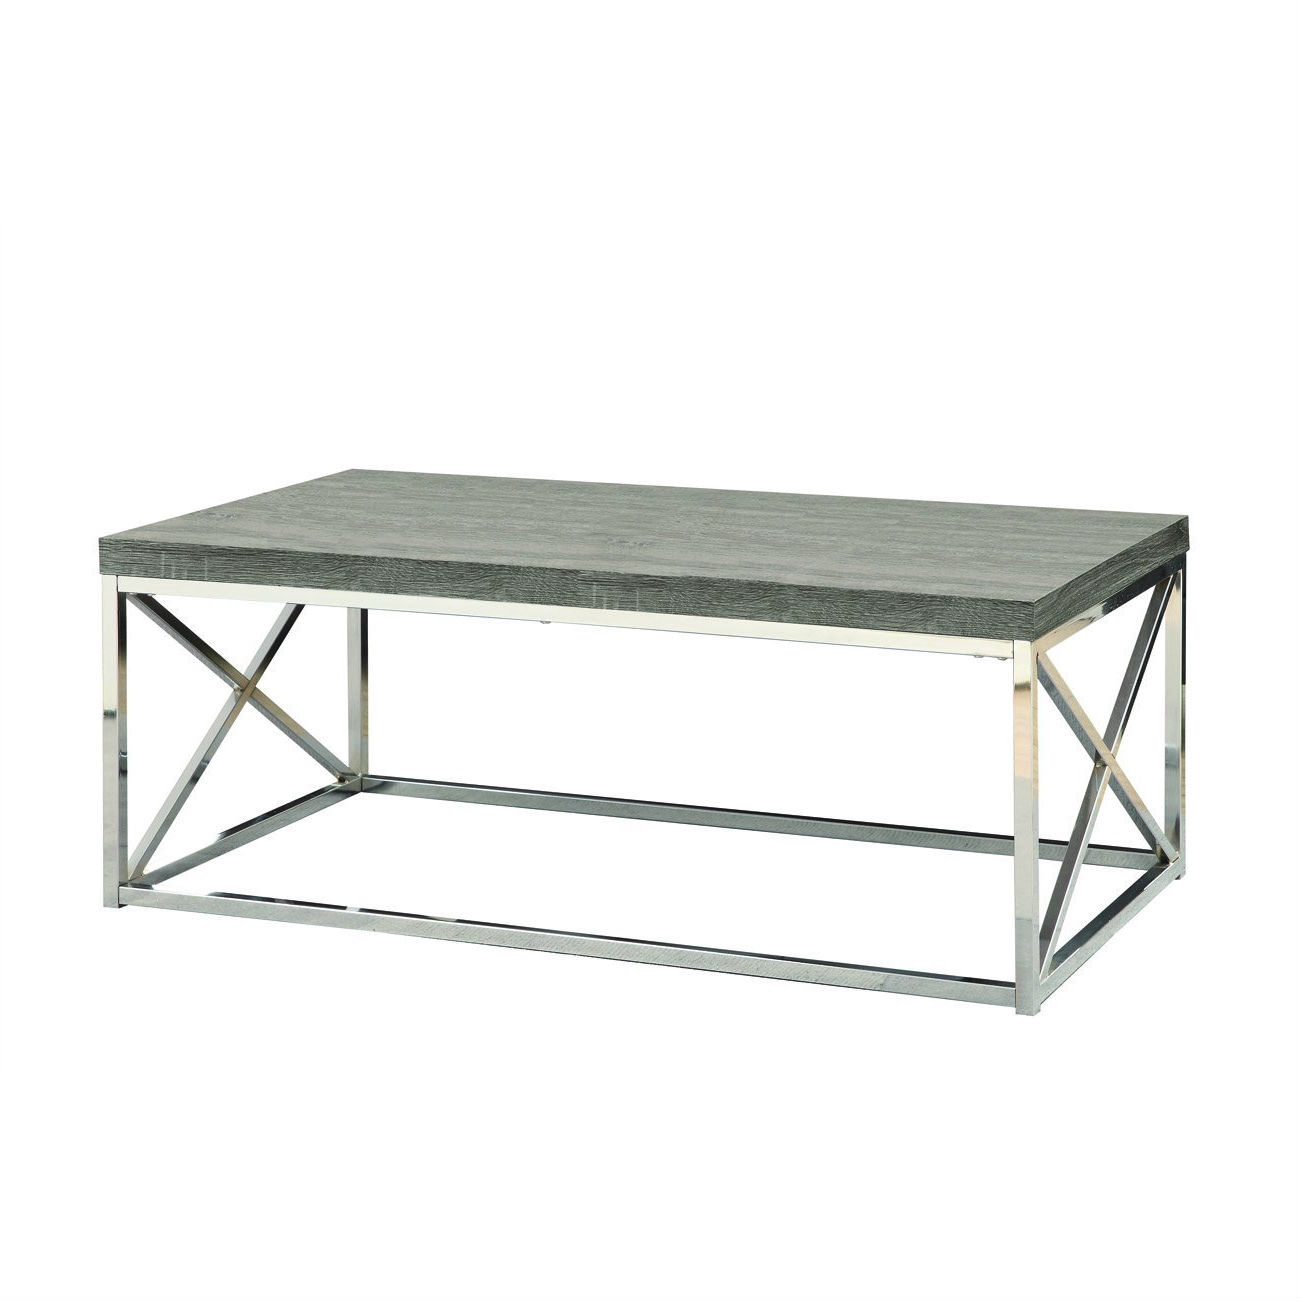 Modern Coffee Table With Chrome Metal Frame And Dark Tape Wood Top |  FastFurnishings.com